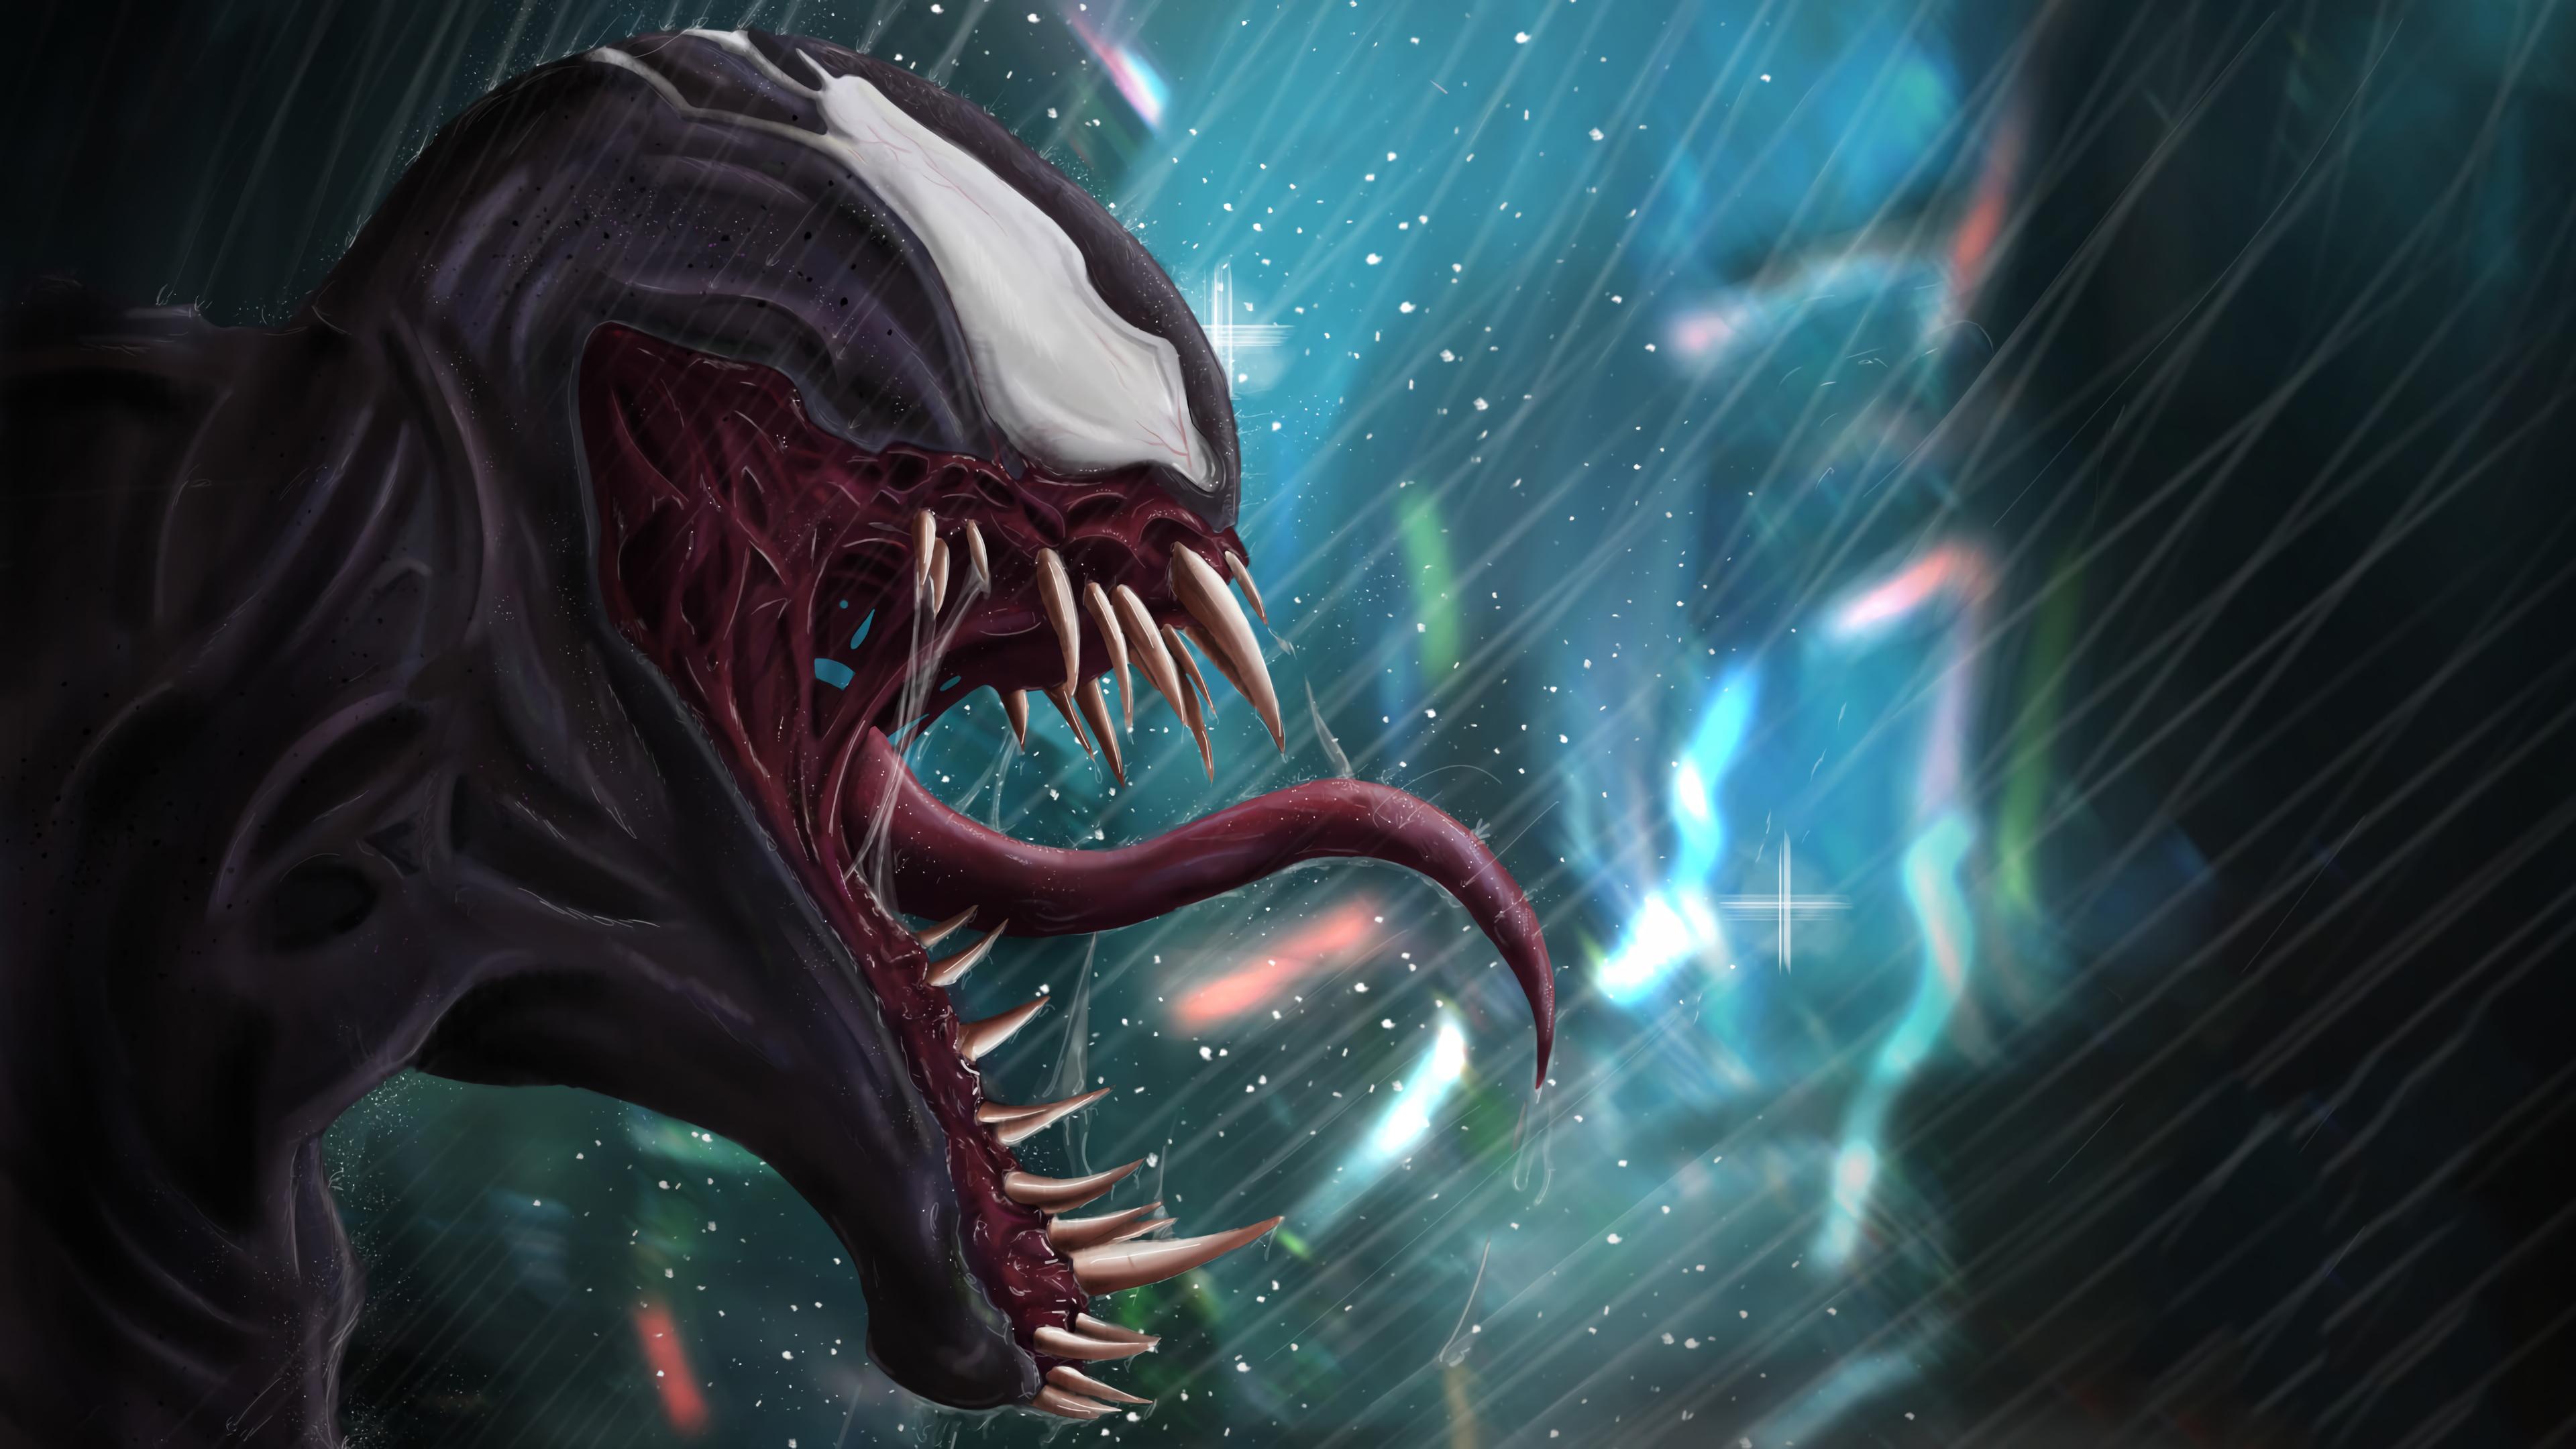 venom art 1568054719 - Venom Art - Venom wallpapers, superheroes wallpapers, hd-wallpapers, digital art wallpapers, artwork wallpapers, artstation wallpapers, 4k-wallpapers